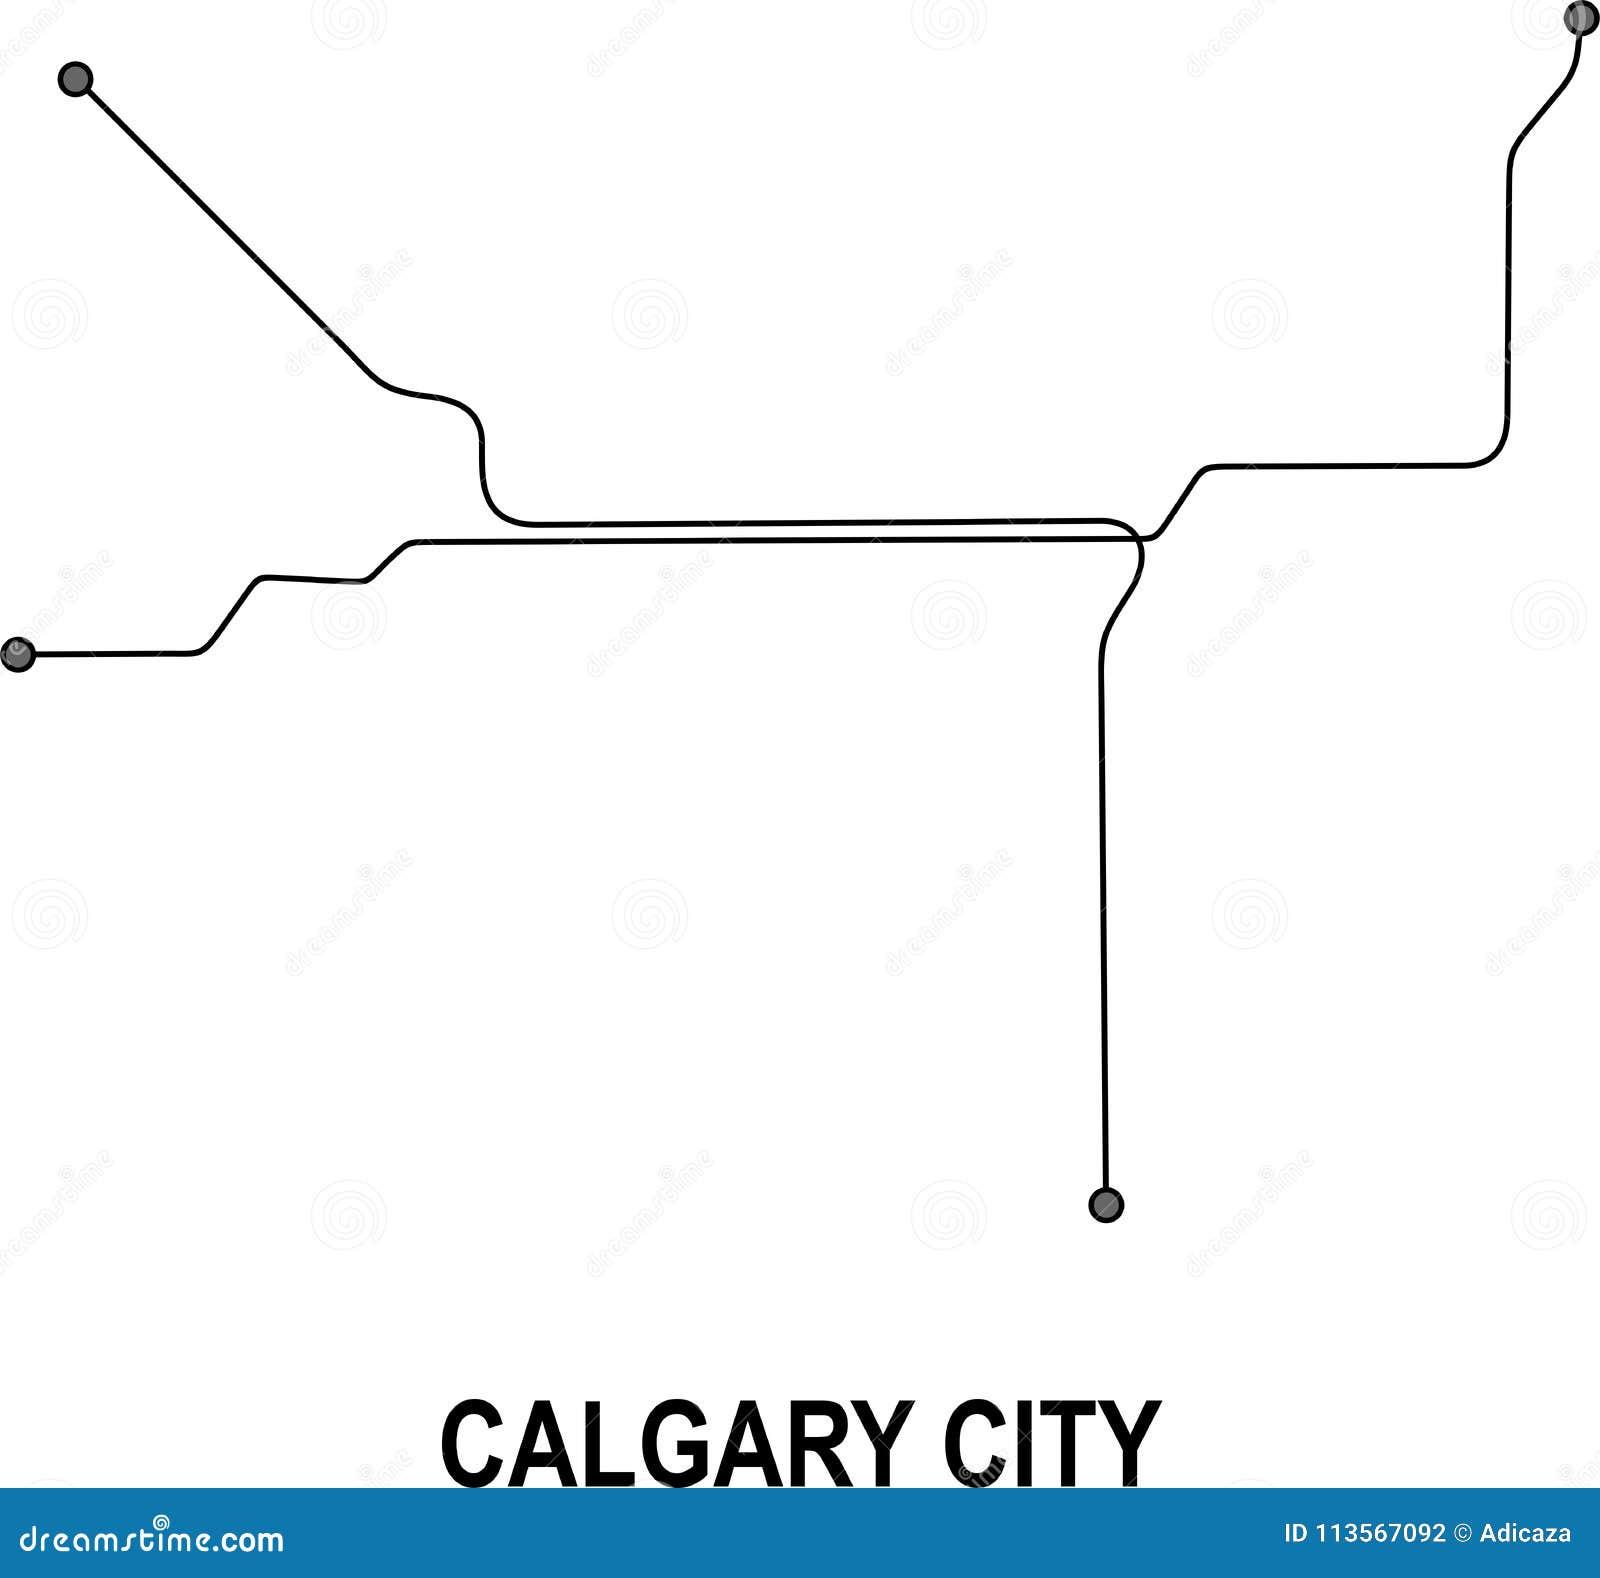 Calgary Subway Map.Calgary City Map Stock Vector Illustration Of Metro 113567092